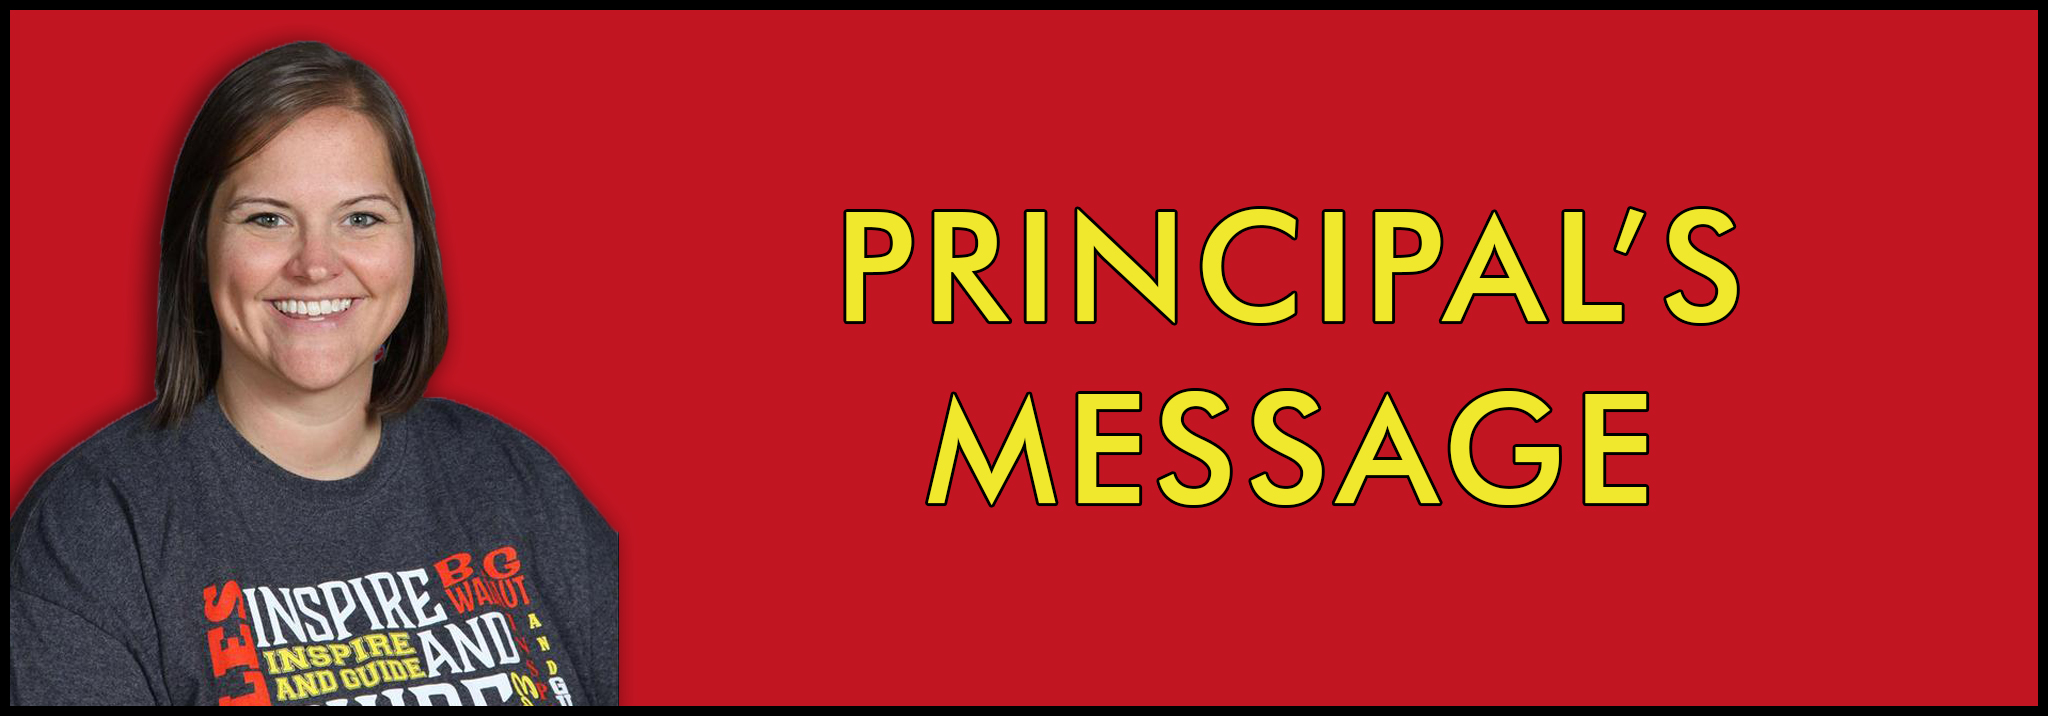 principal's message tout